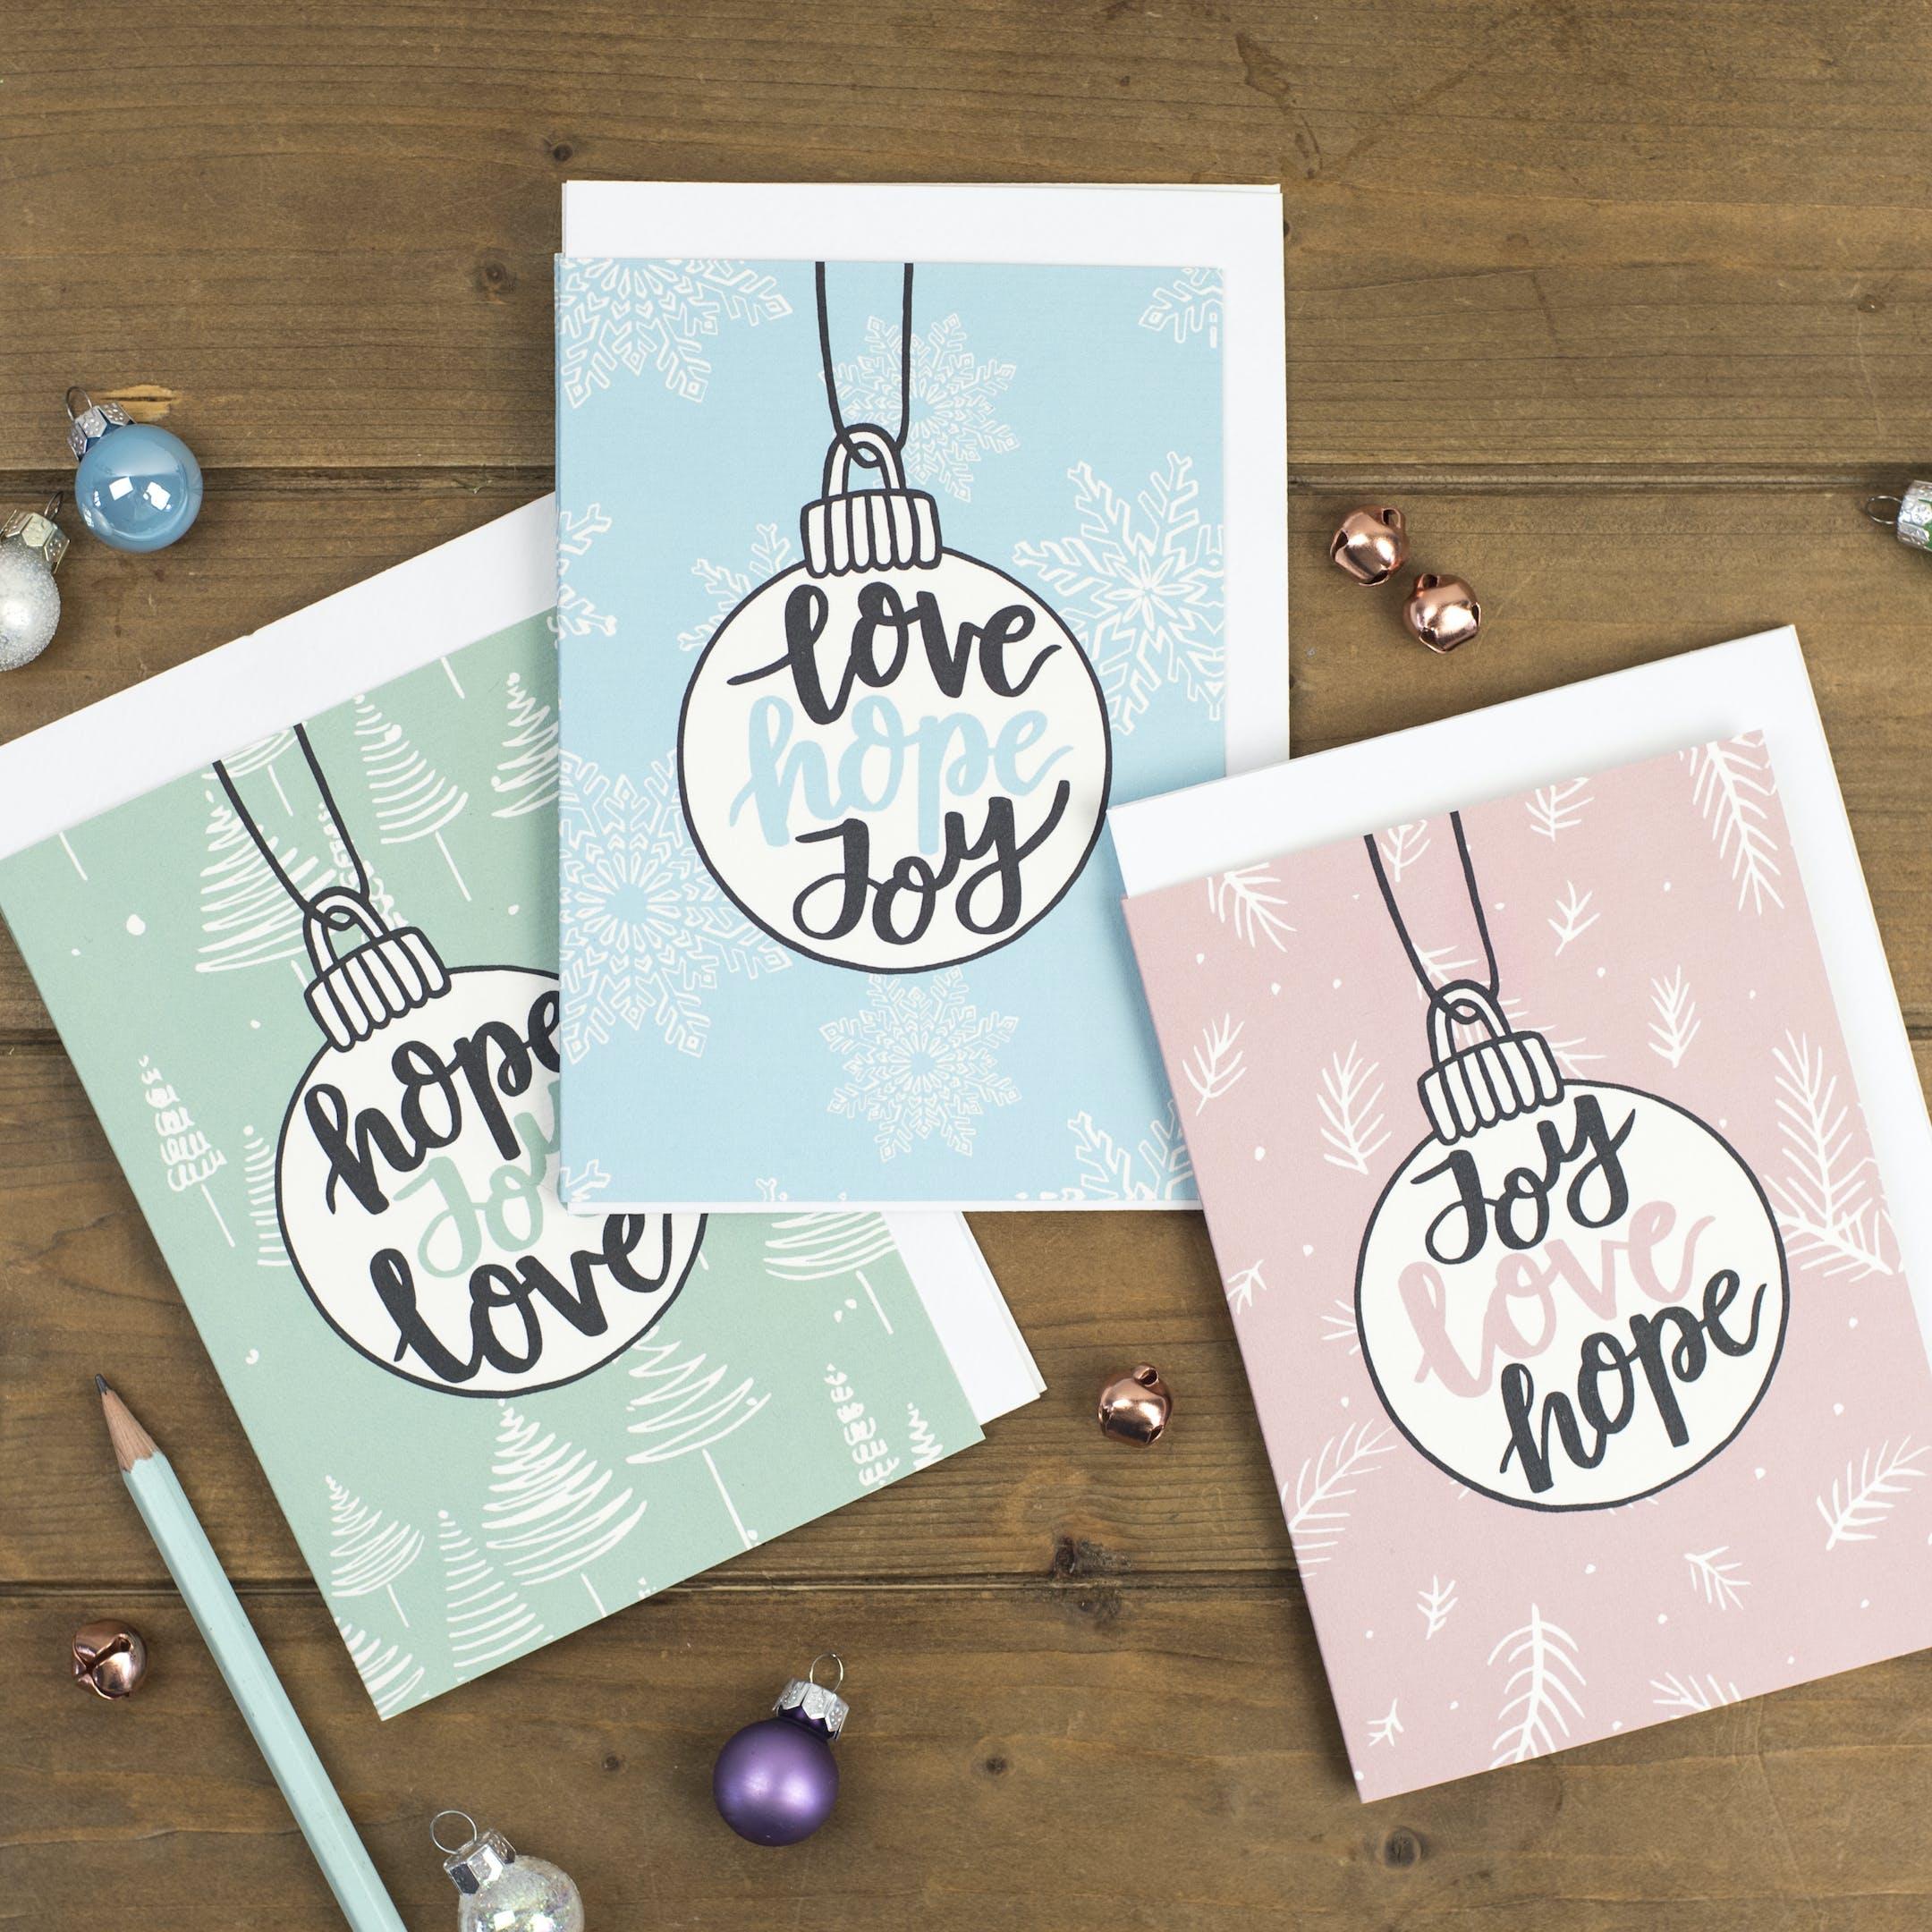 Hope Joy Love Christmas Cards - Izzy and Pop